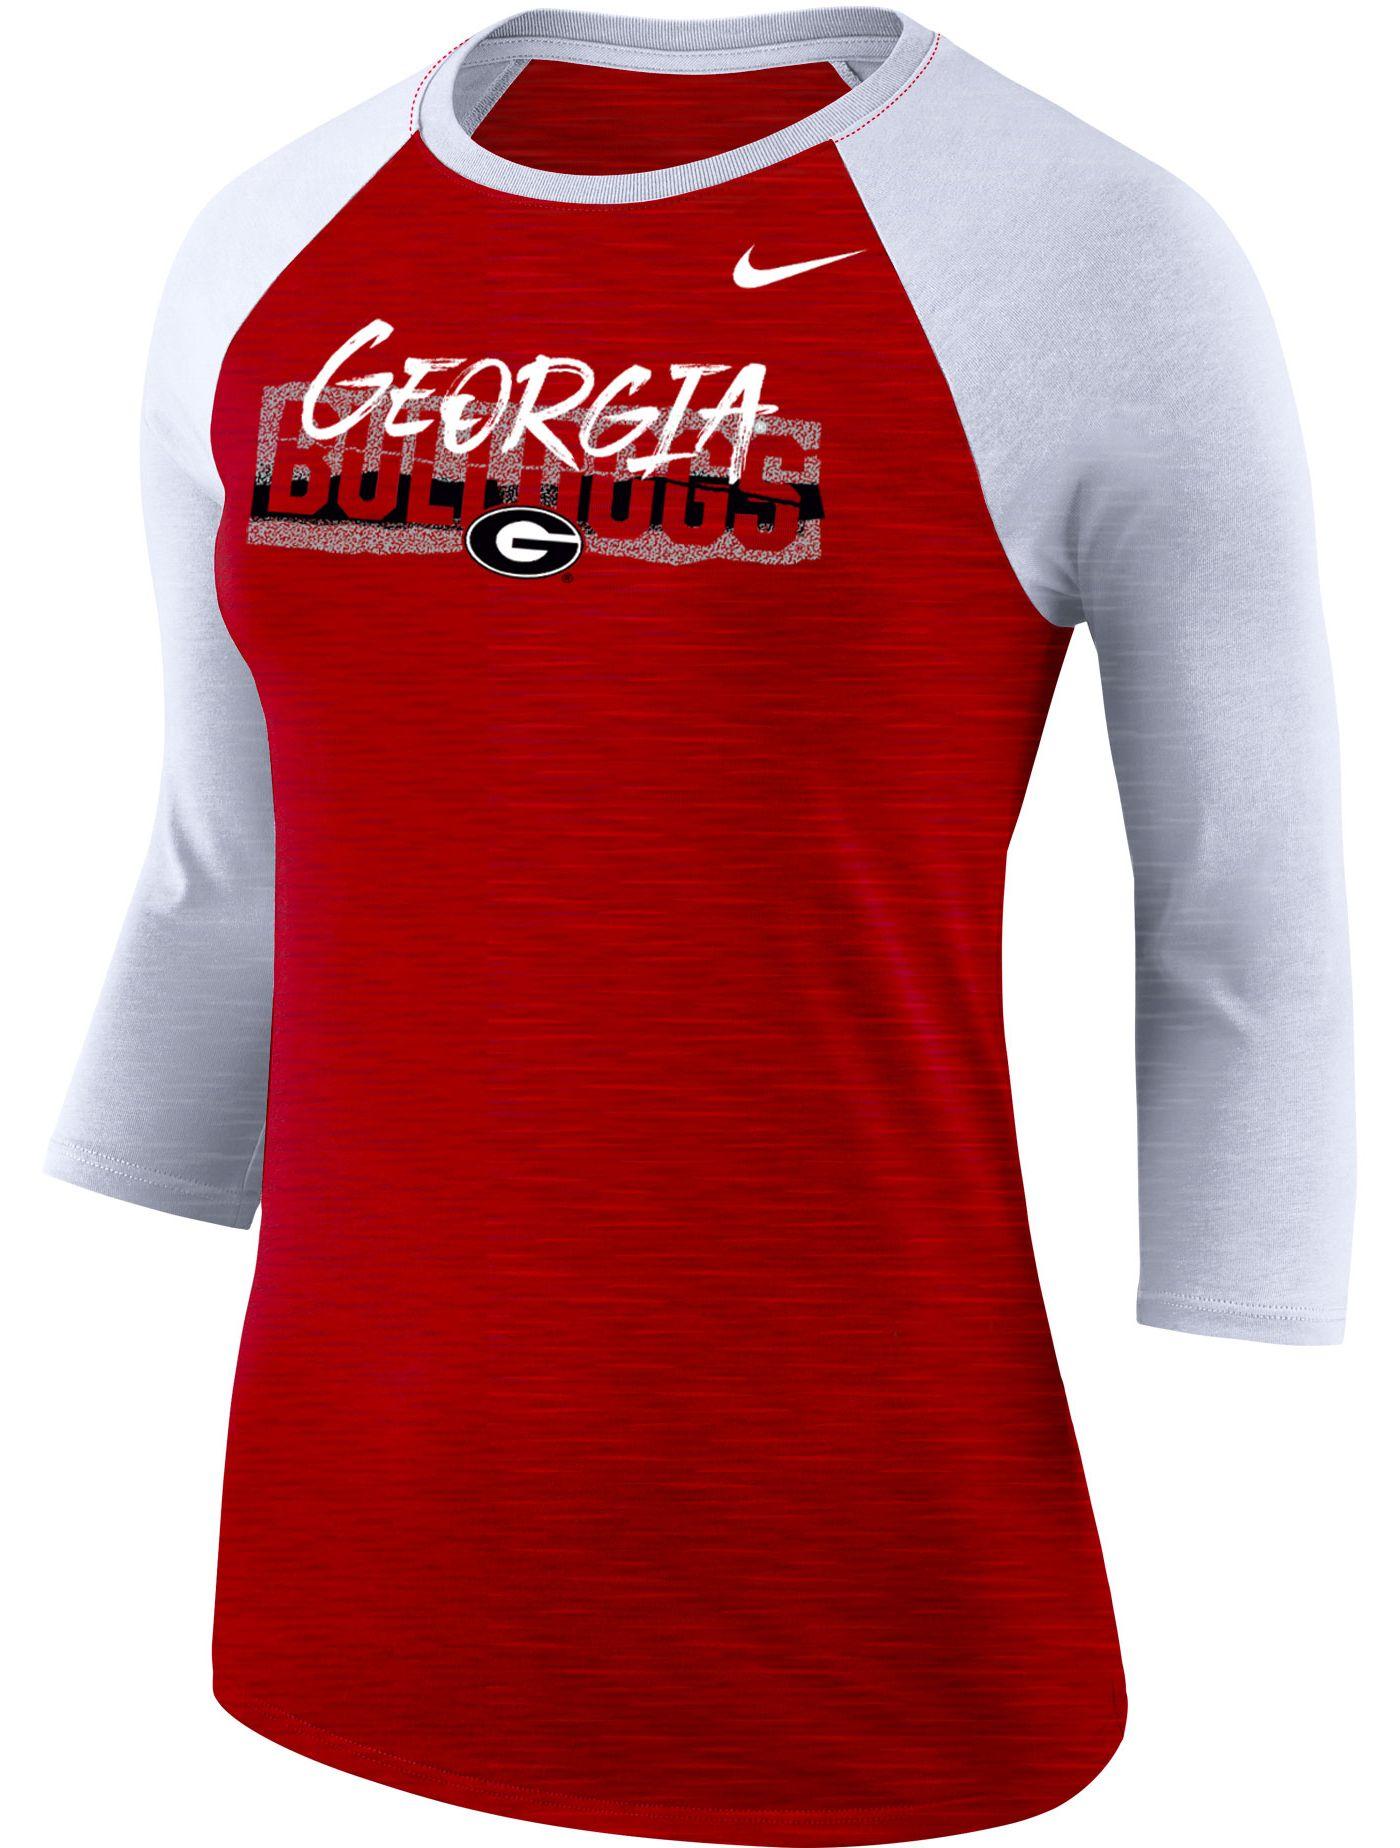 Nike Women's Georgia Bulldogs Red Dri-FIT ¾ Sleeve T-Shirt